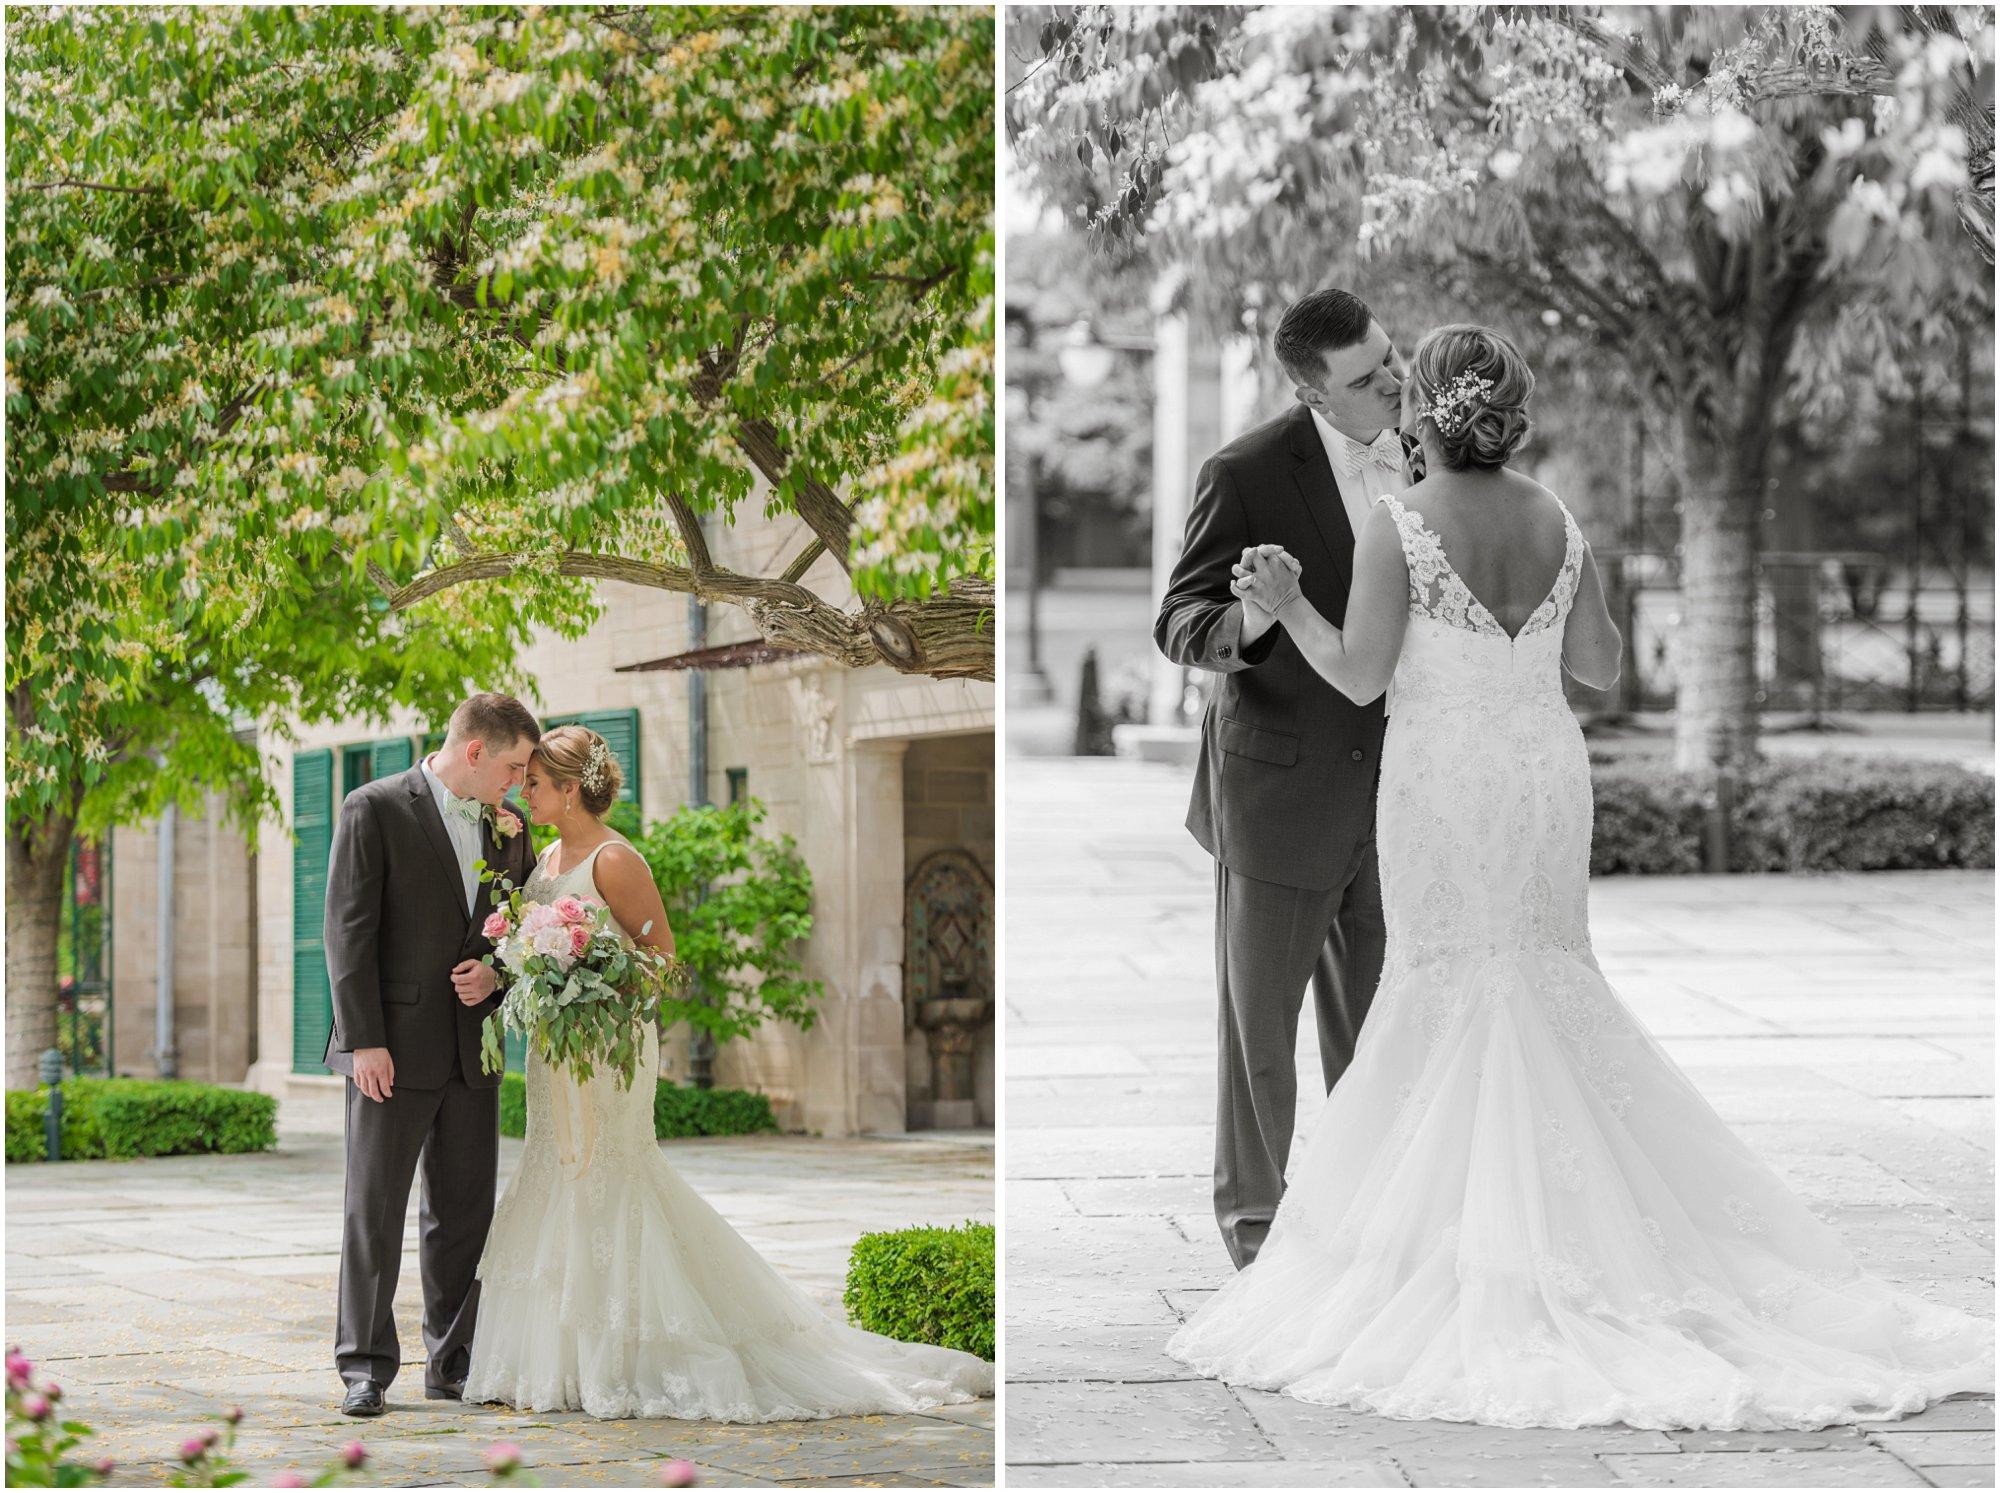 Plymouth_michigan_wedding_photographer_0405.jpg